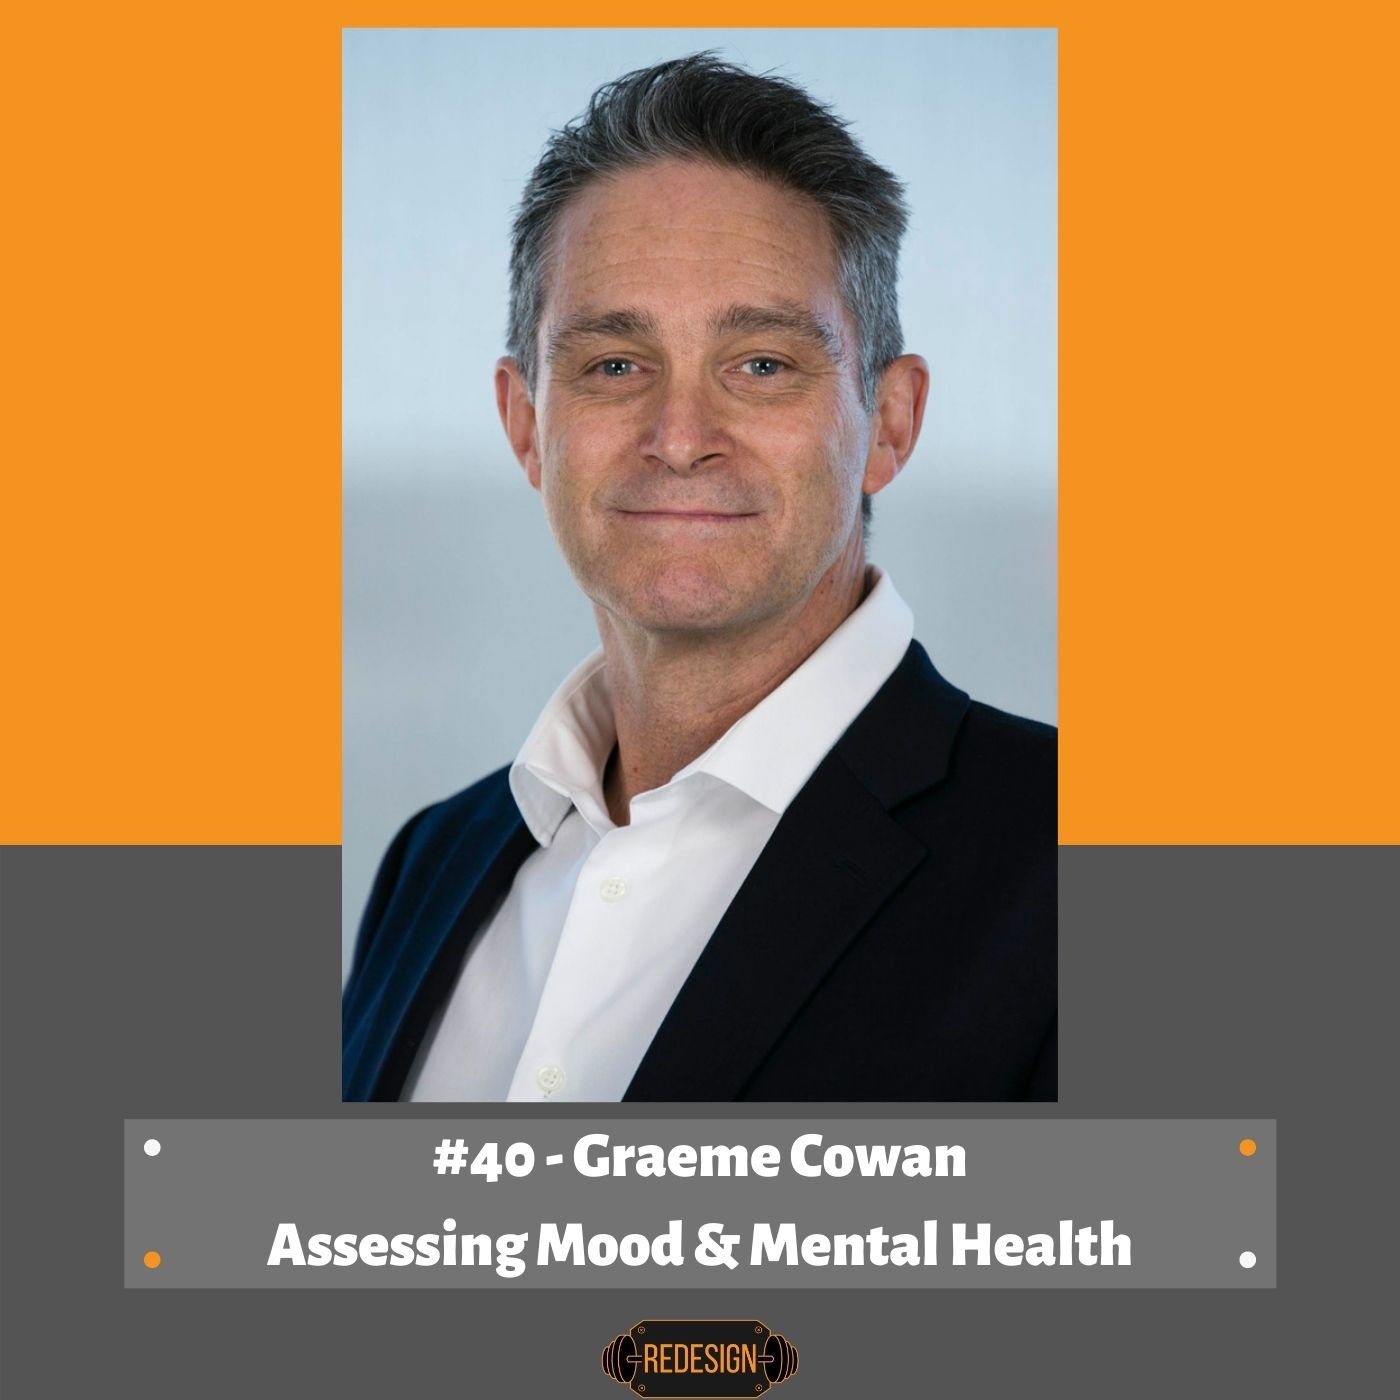 Episode 040 - Graeme Cowan on  RUOK, Assessing Mood, Mental Health & Resilience